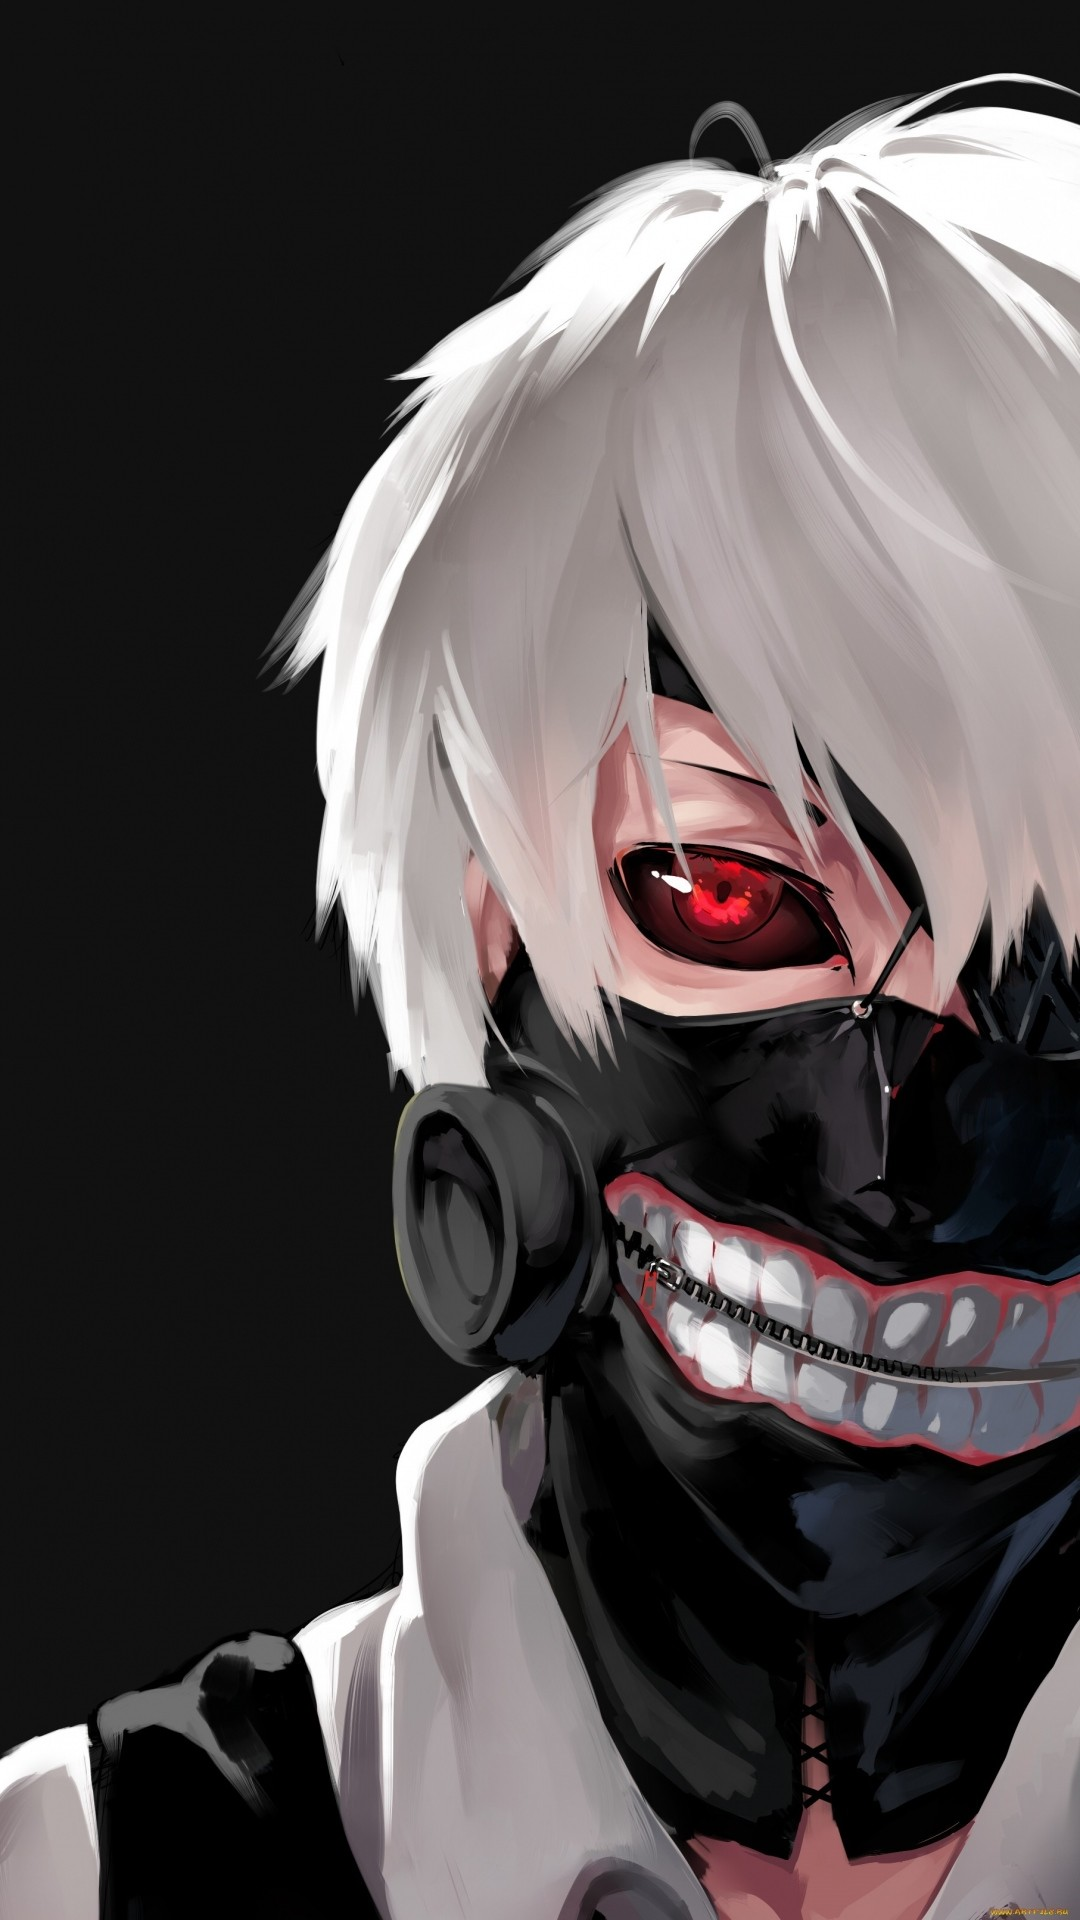 Preview wallpaper tokyo ghoul, kaneki ken, man, mask, face 1080×1920